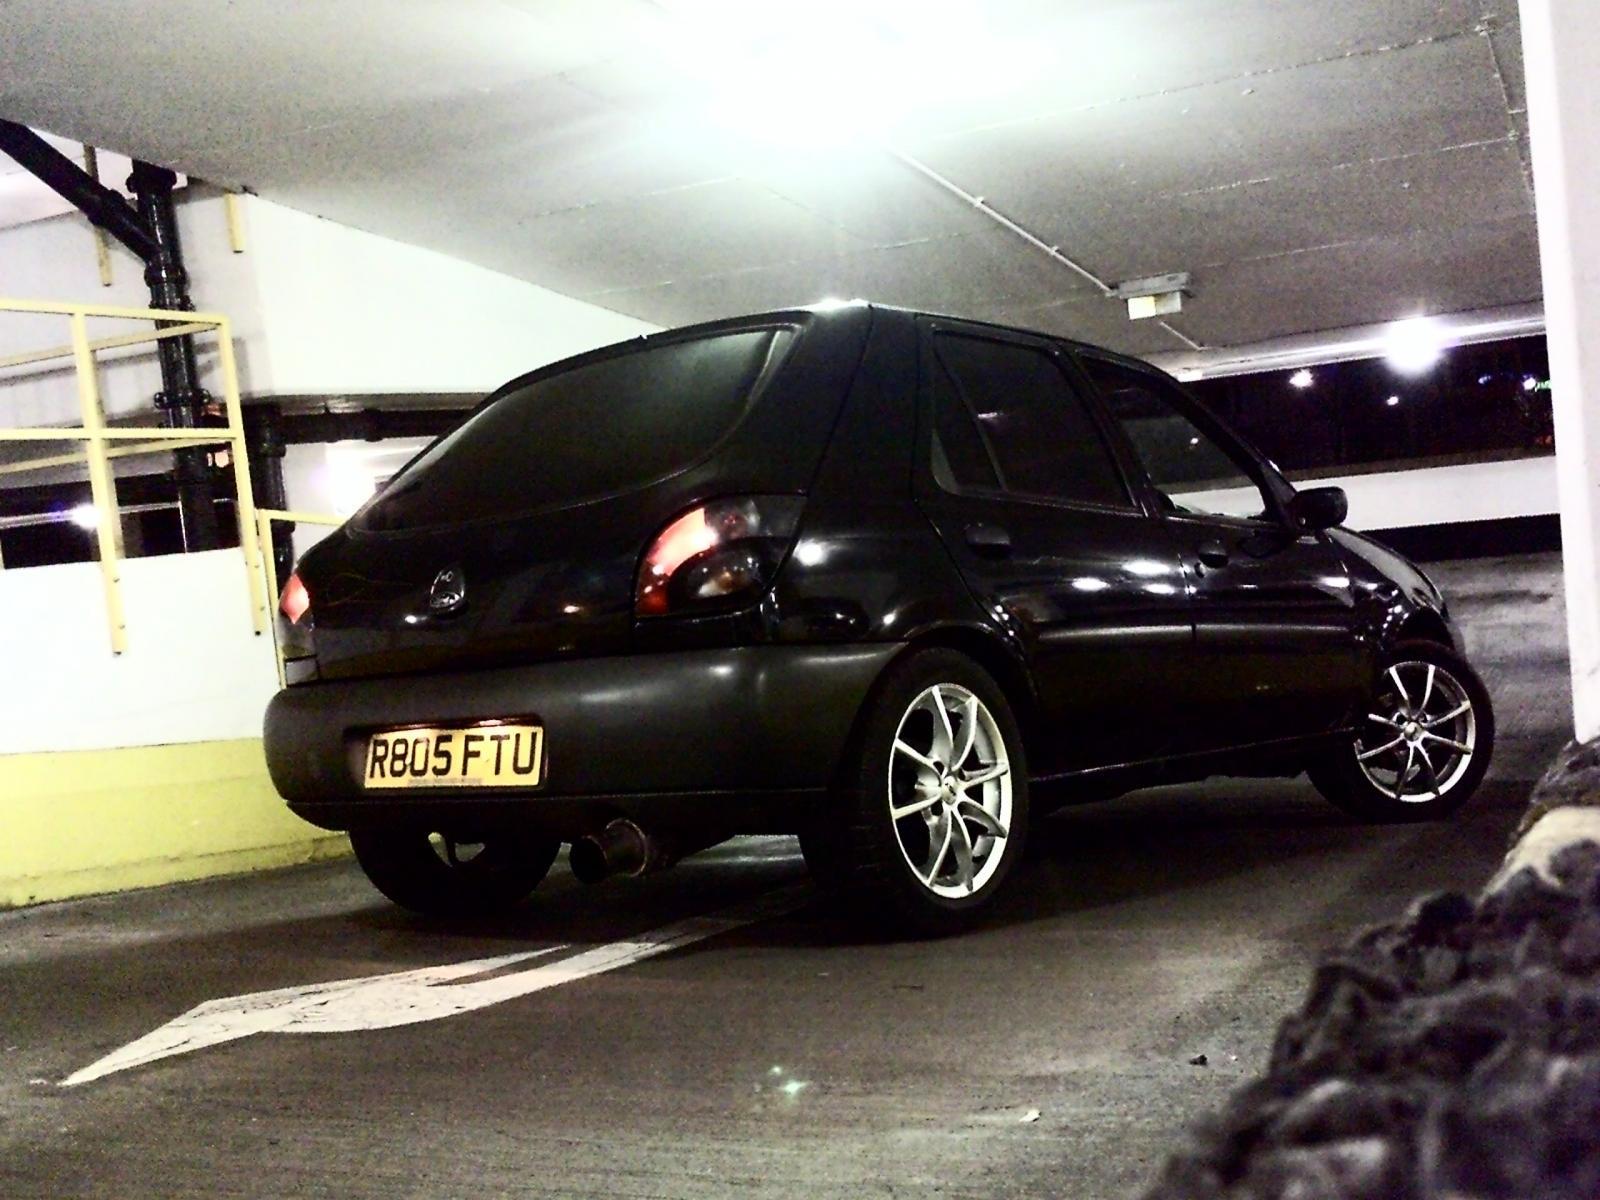 MK 4 Fiesta